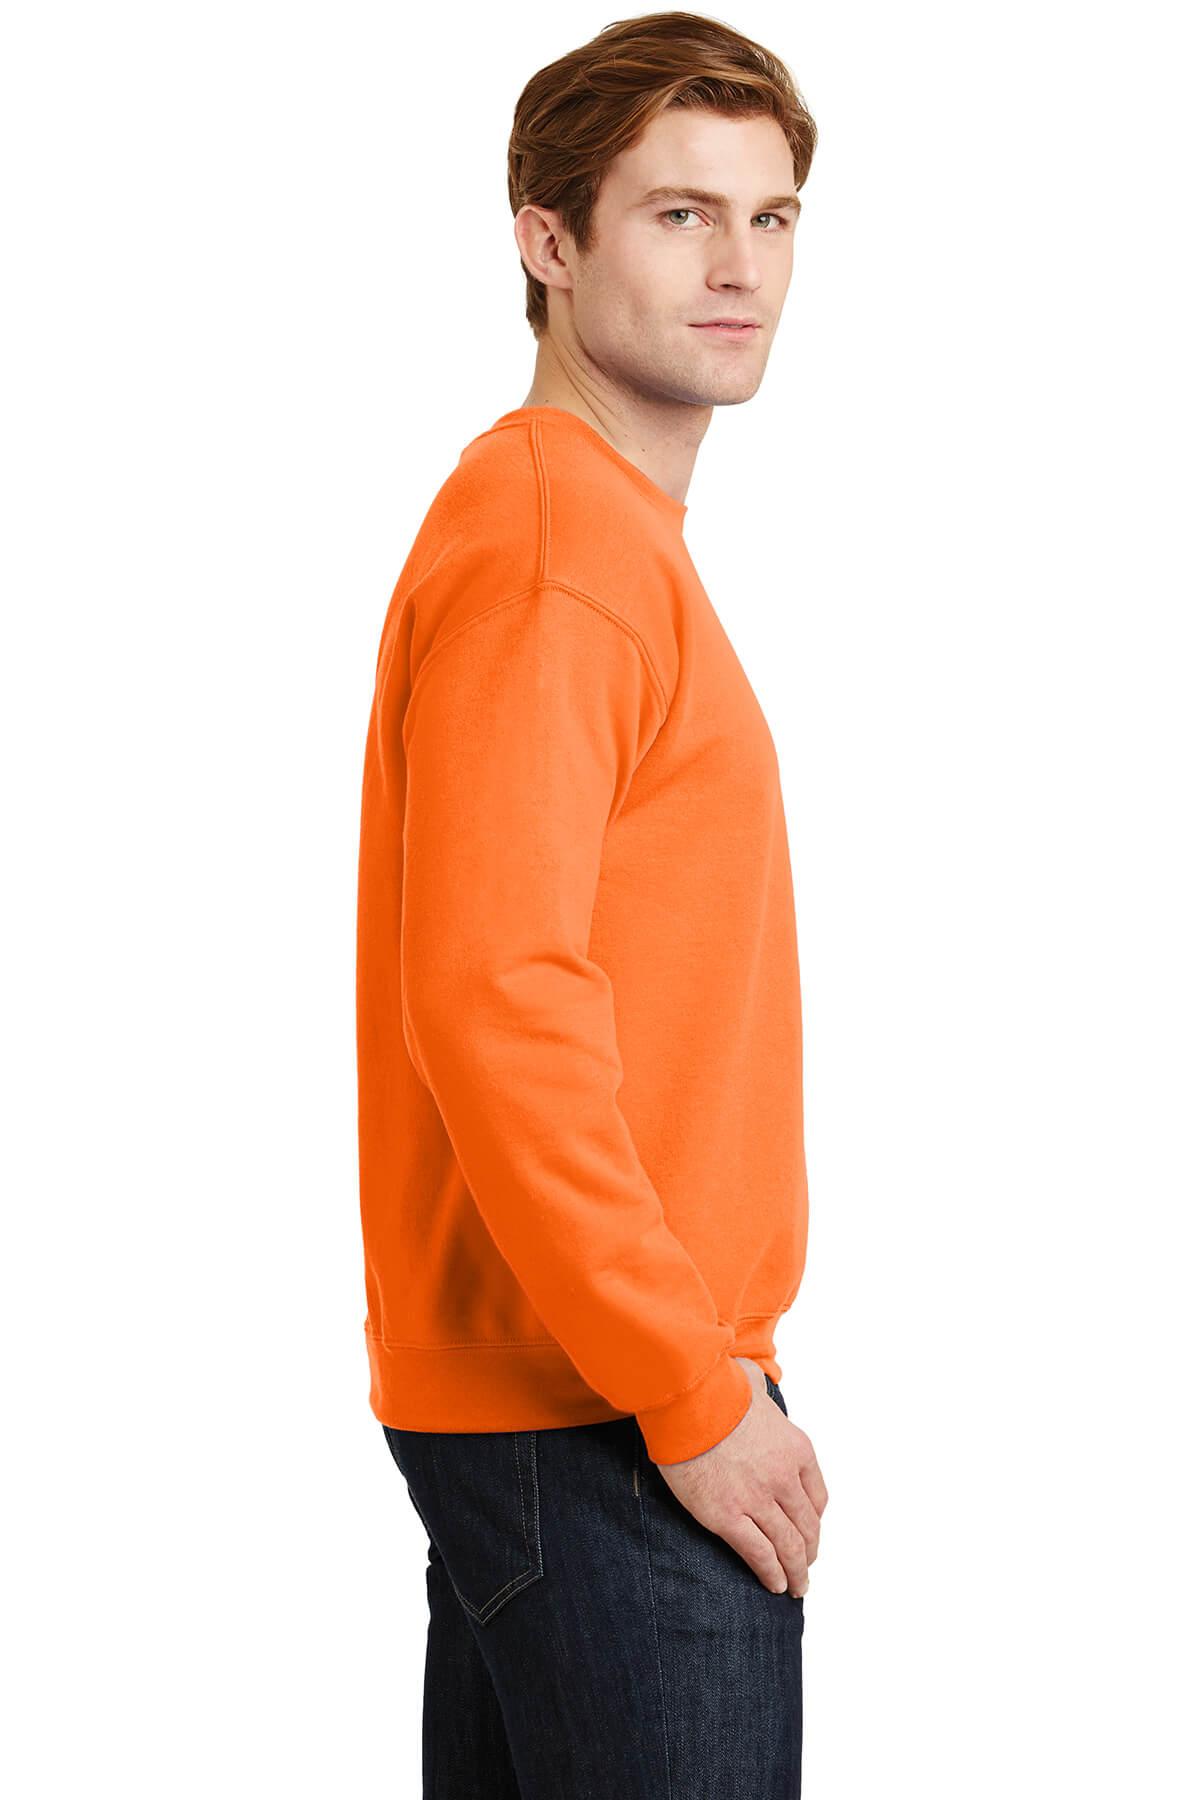 18000-southern-orange-3